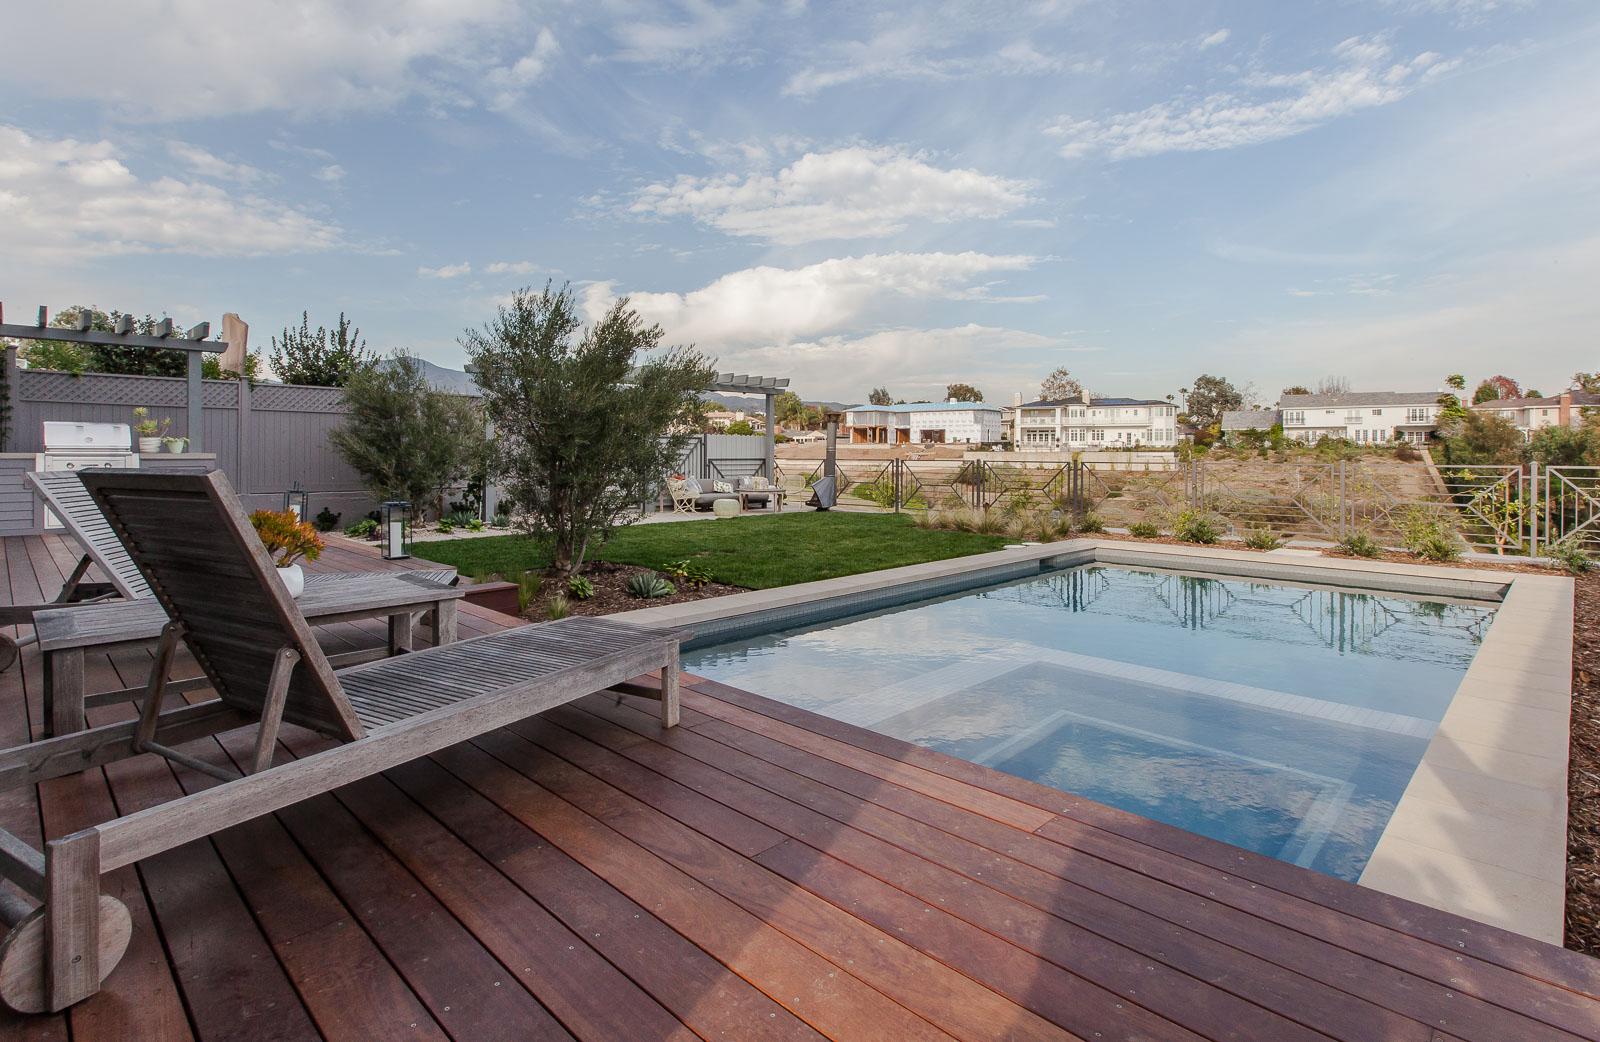 Depauw pool and landscape cj paone aia ventura ca for Pool design ventura